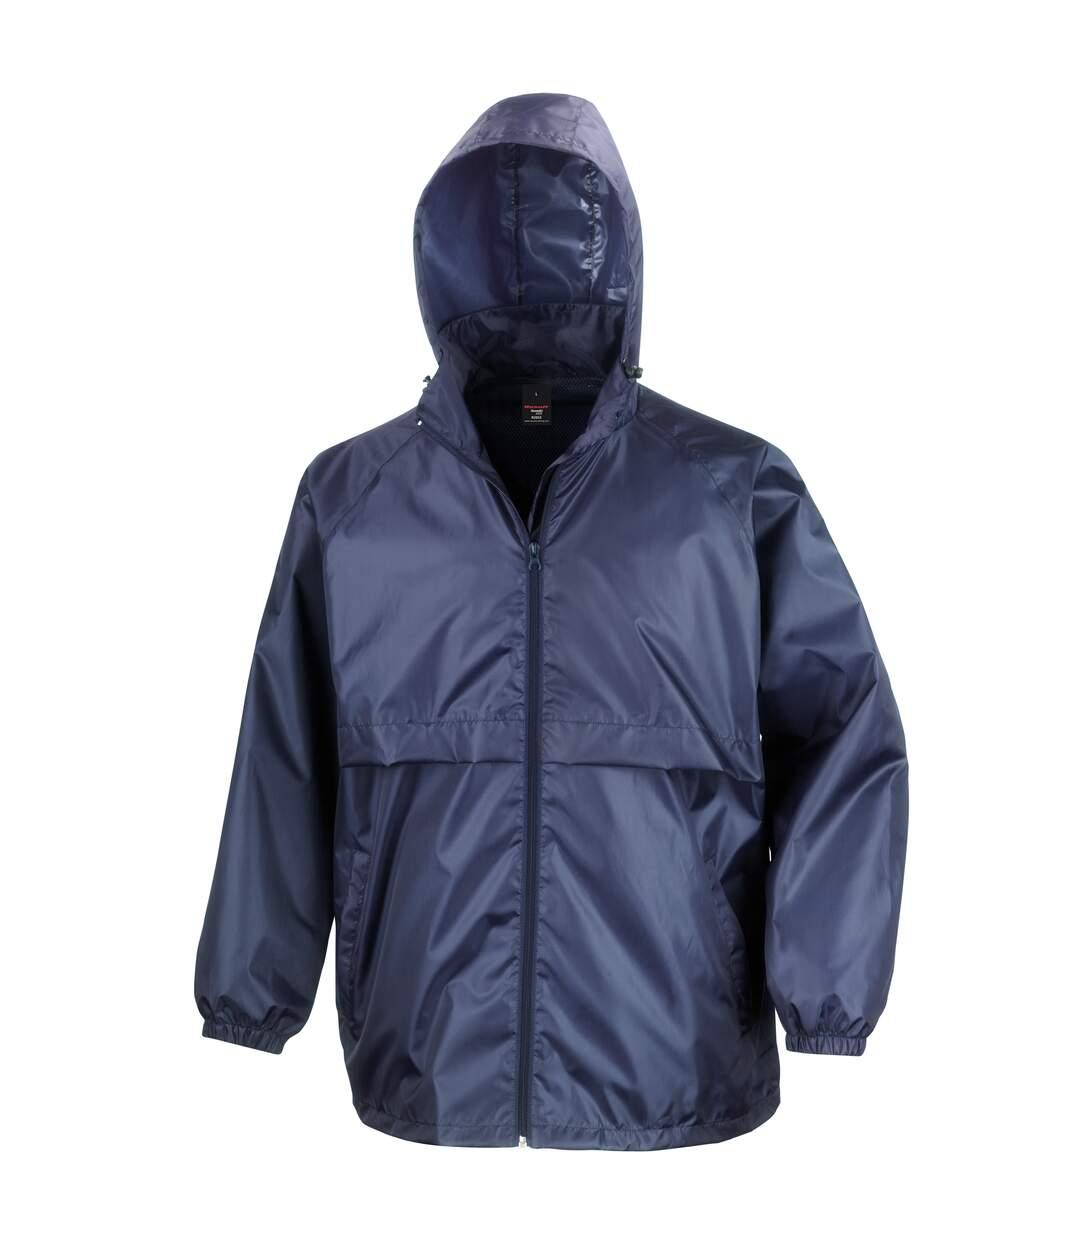 Result Mens Core Lightweight Waterproof Shield Windproof Jacket (Navy Blue) - UTBC898